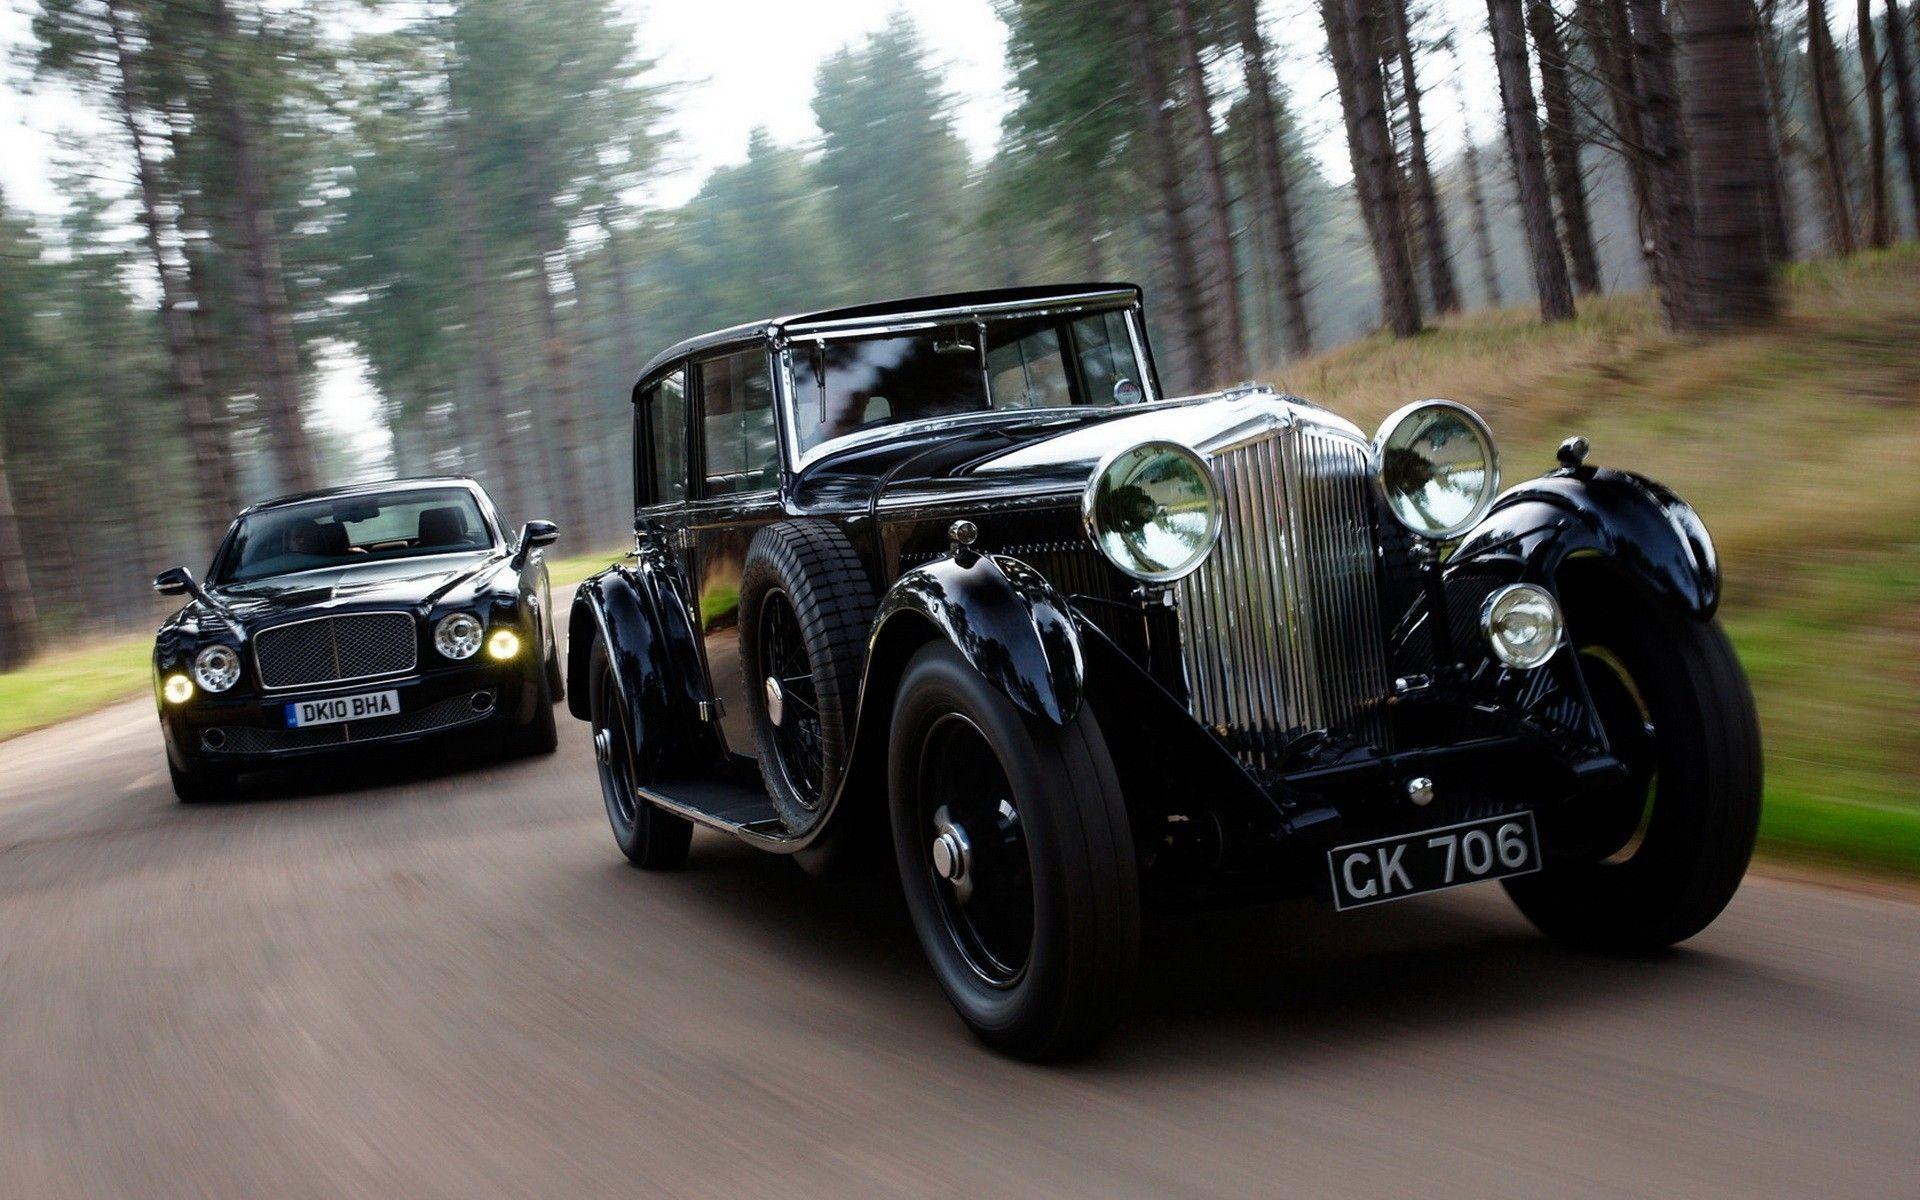 Old Bentley And New Bentley With Images Super Cars Cars Bentley